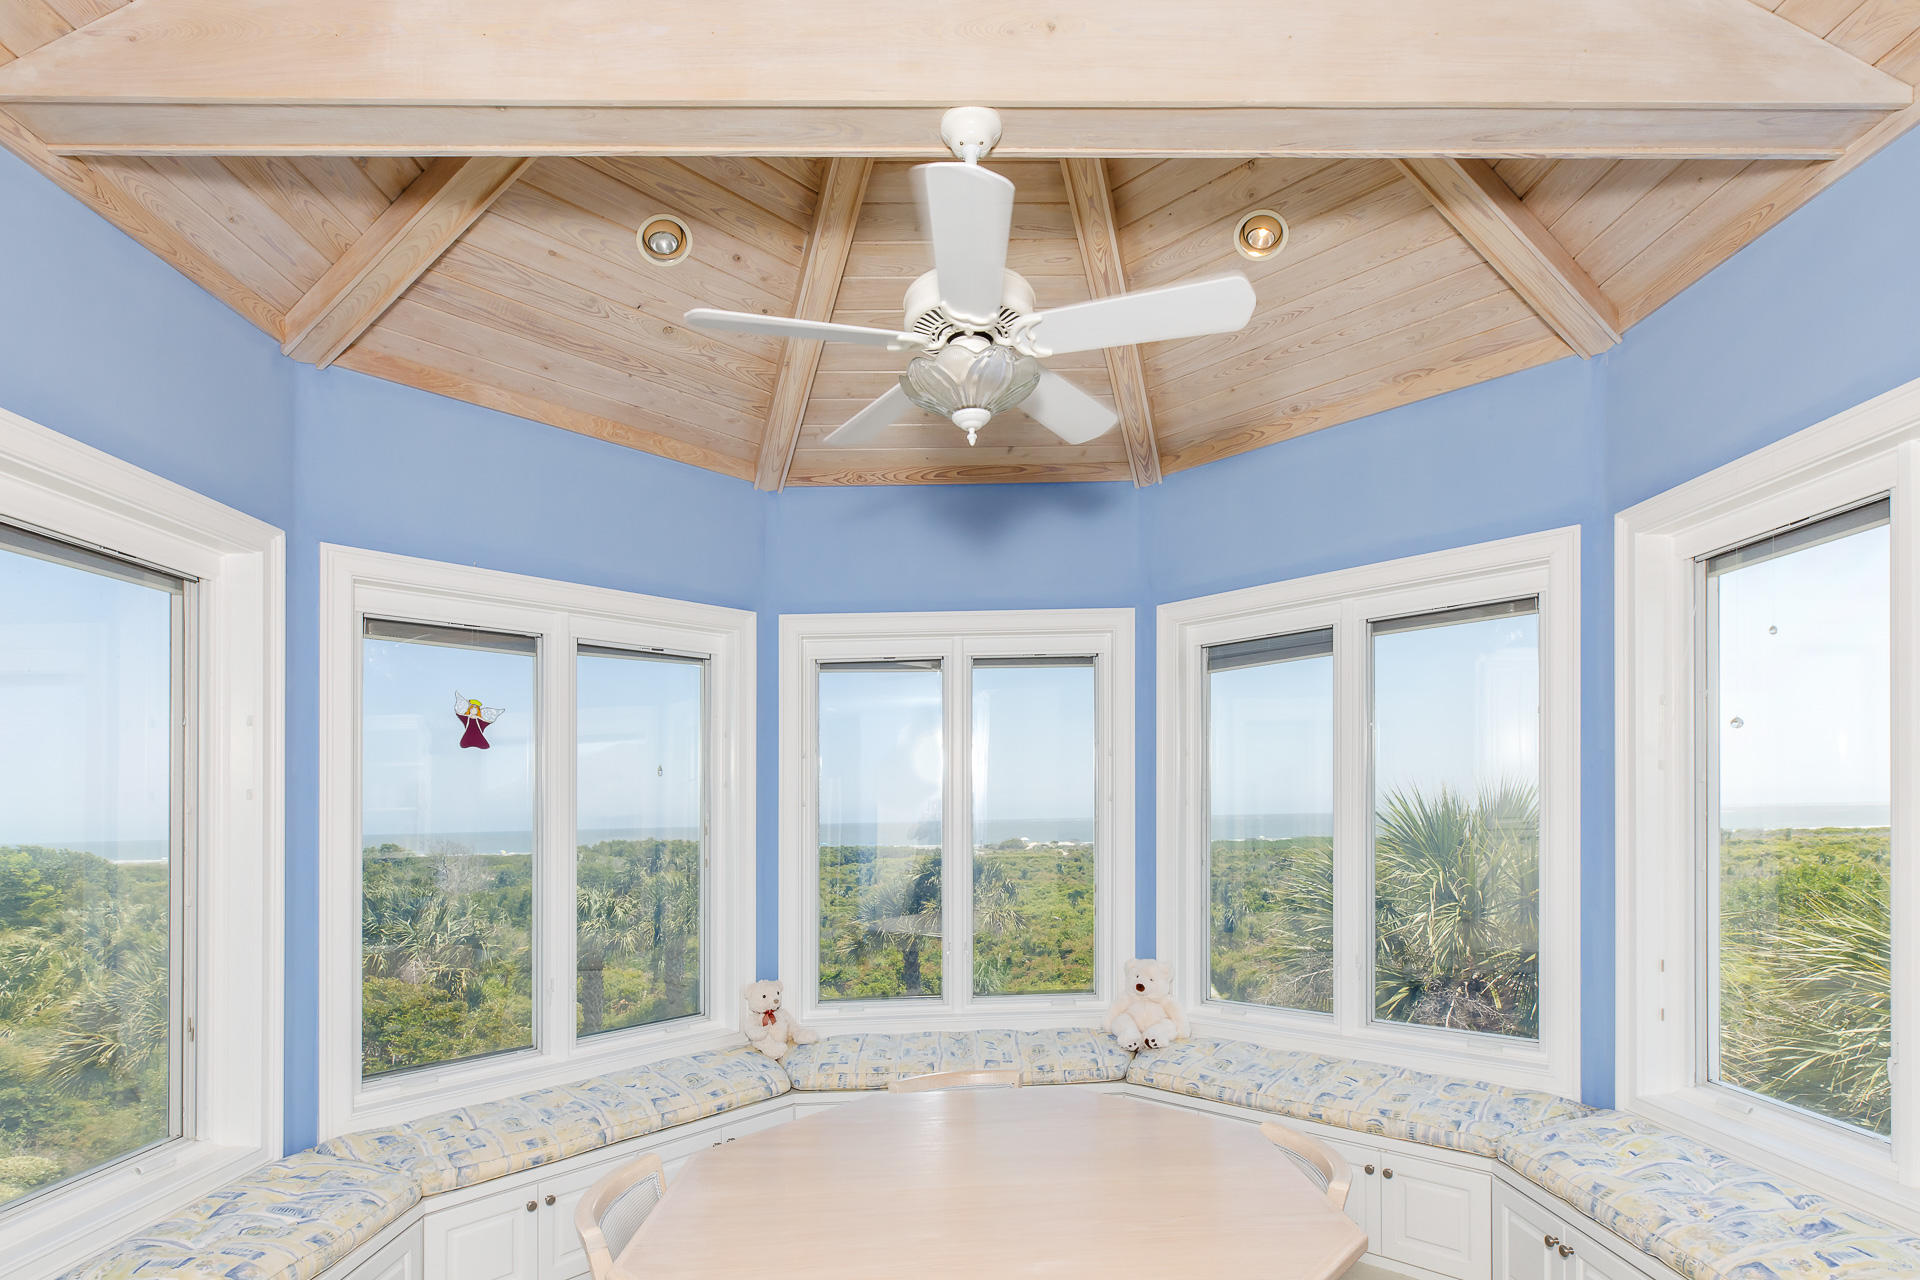 Seabrook Island Homes For Sale - 2216 Rolling Dune, Seabrook Island, SC - 78